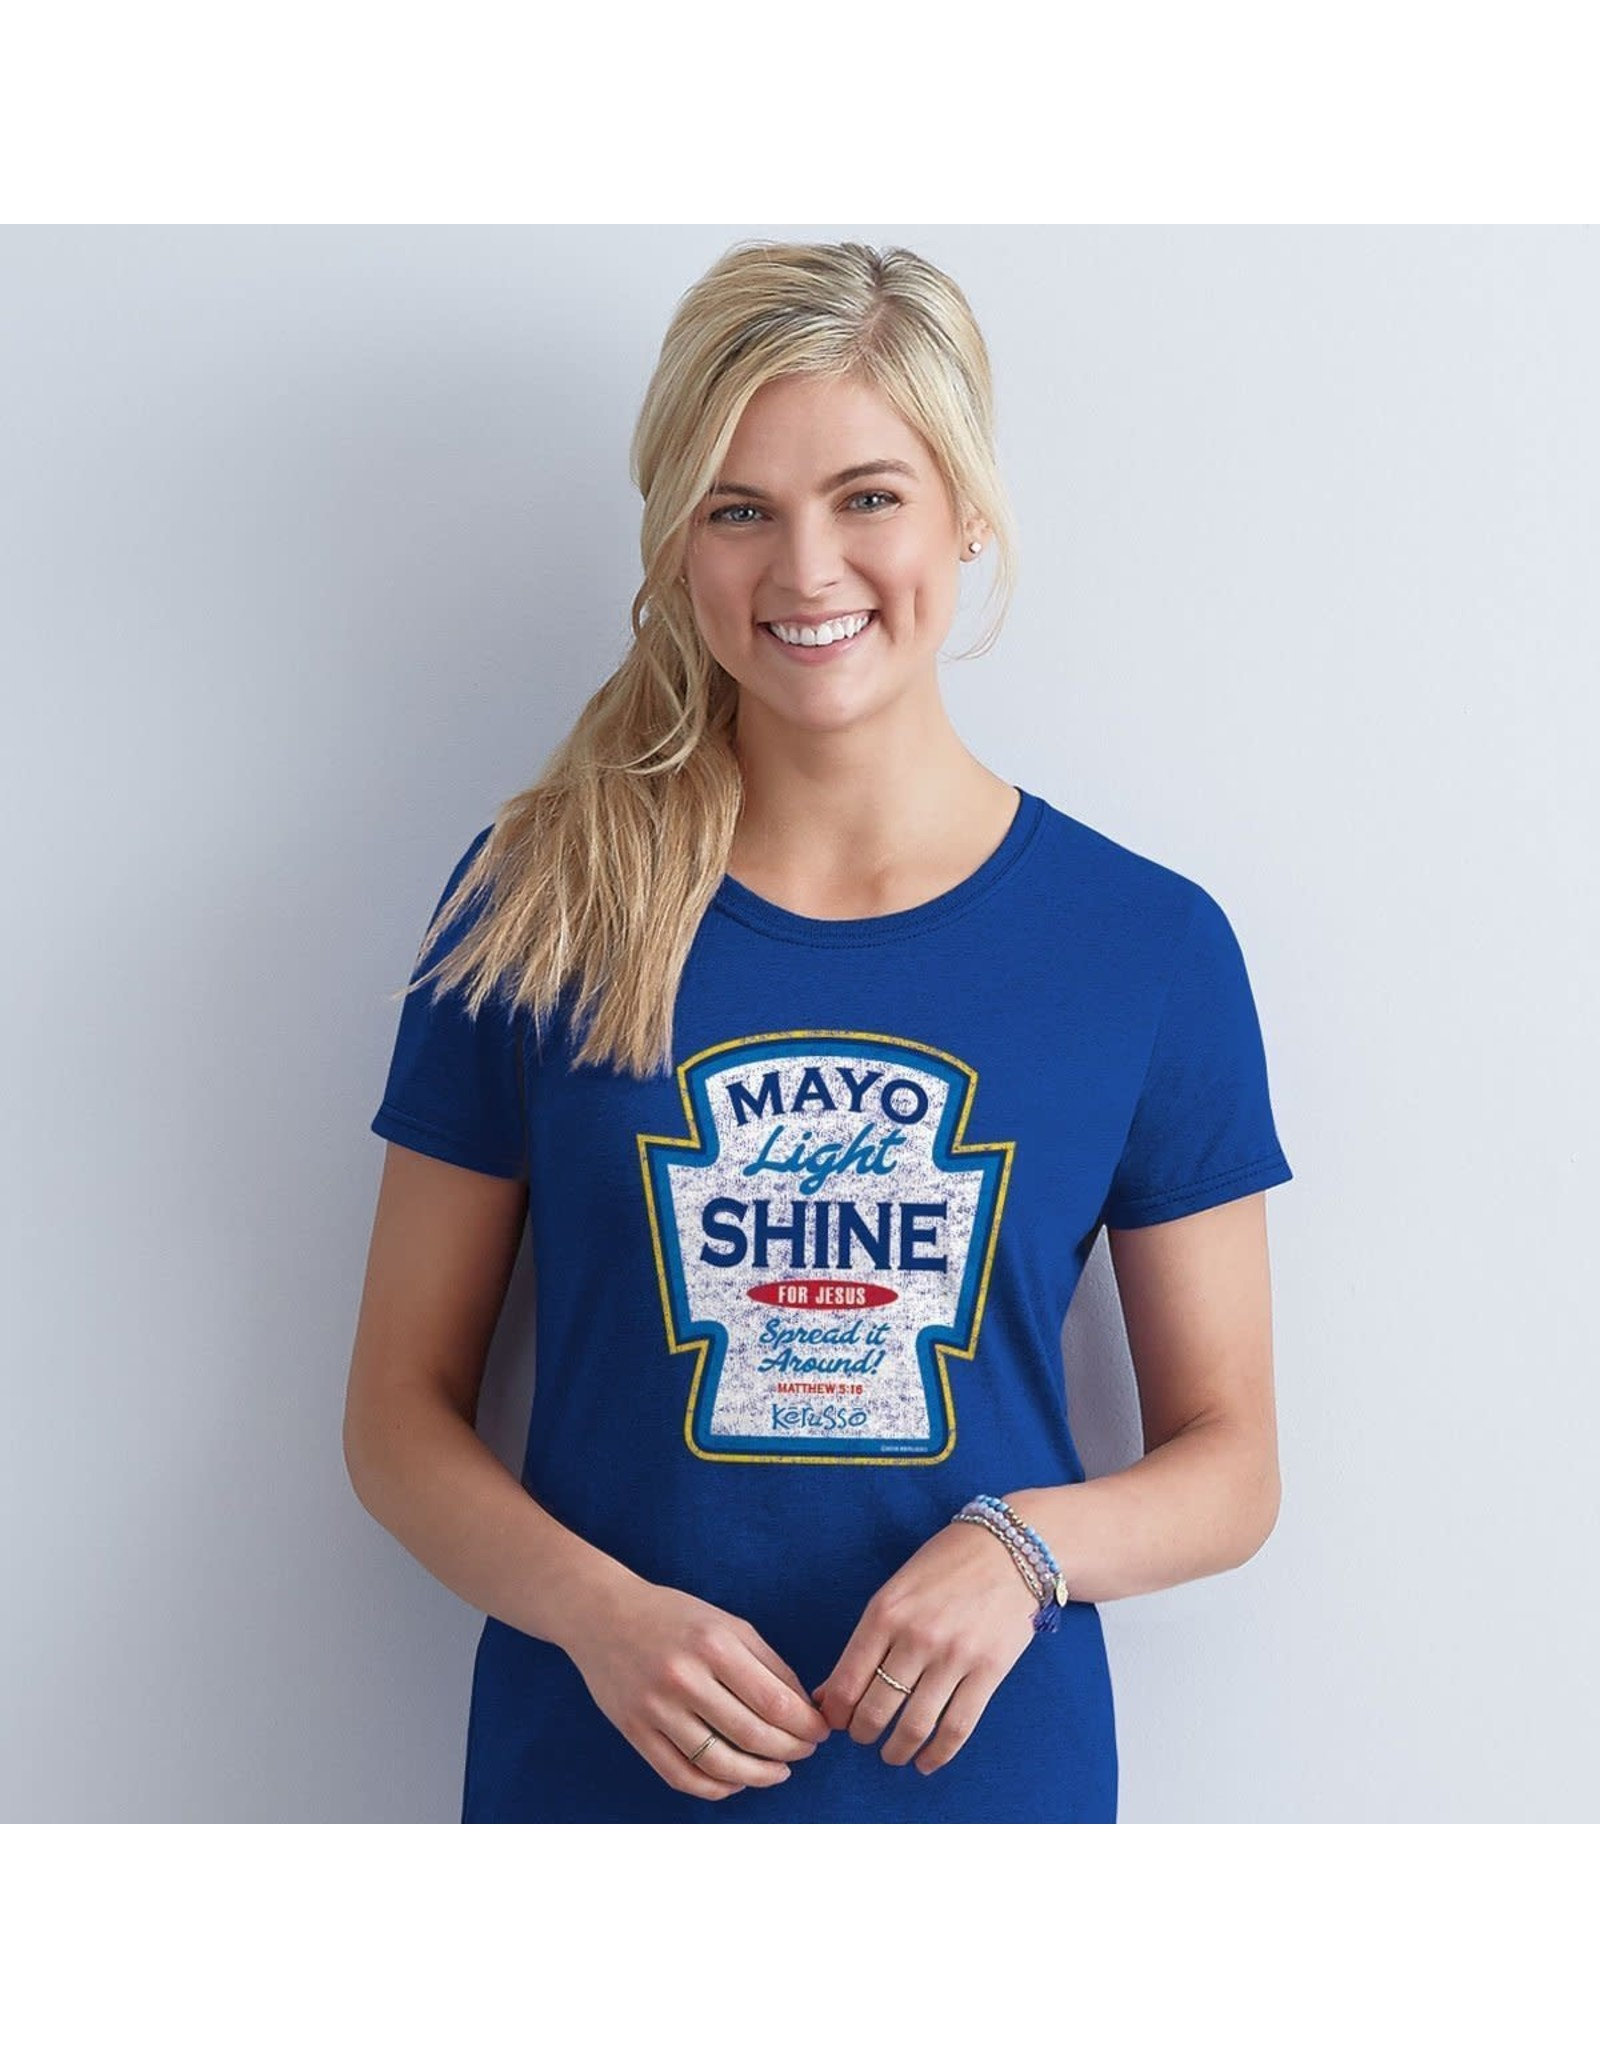 Adult Shirt - Mayo Light Shine